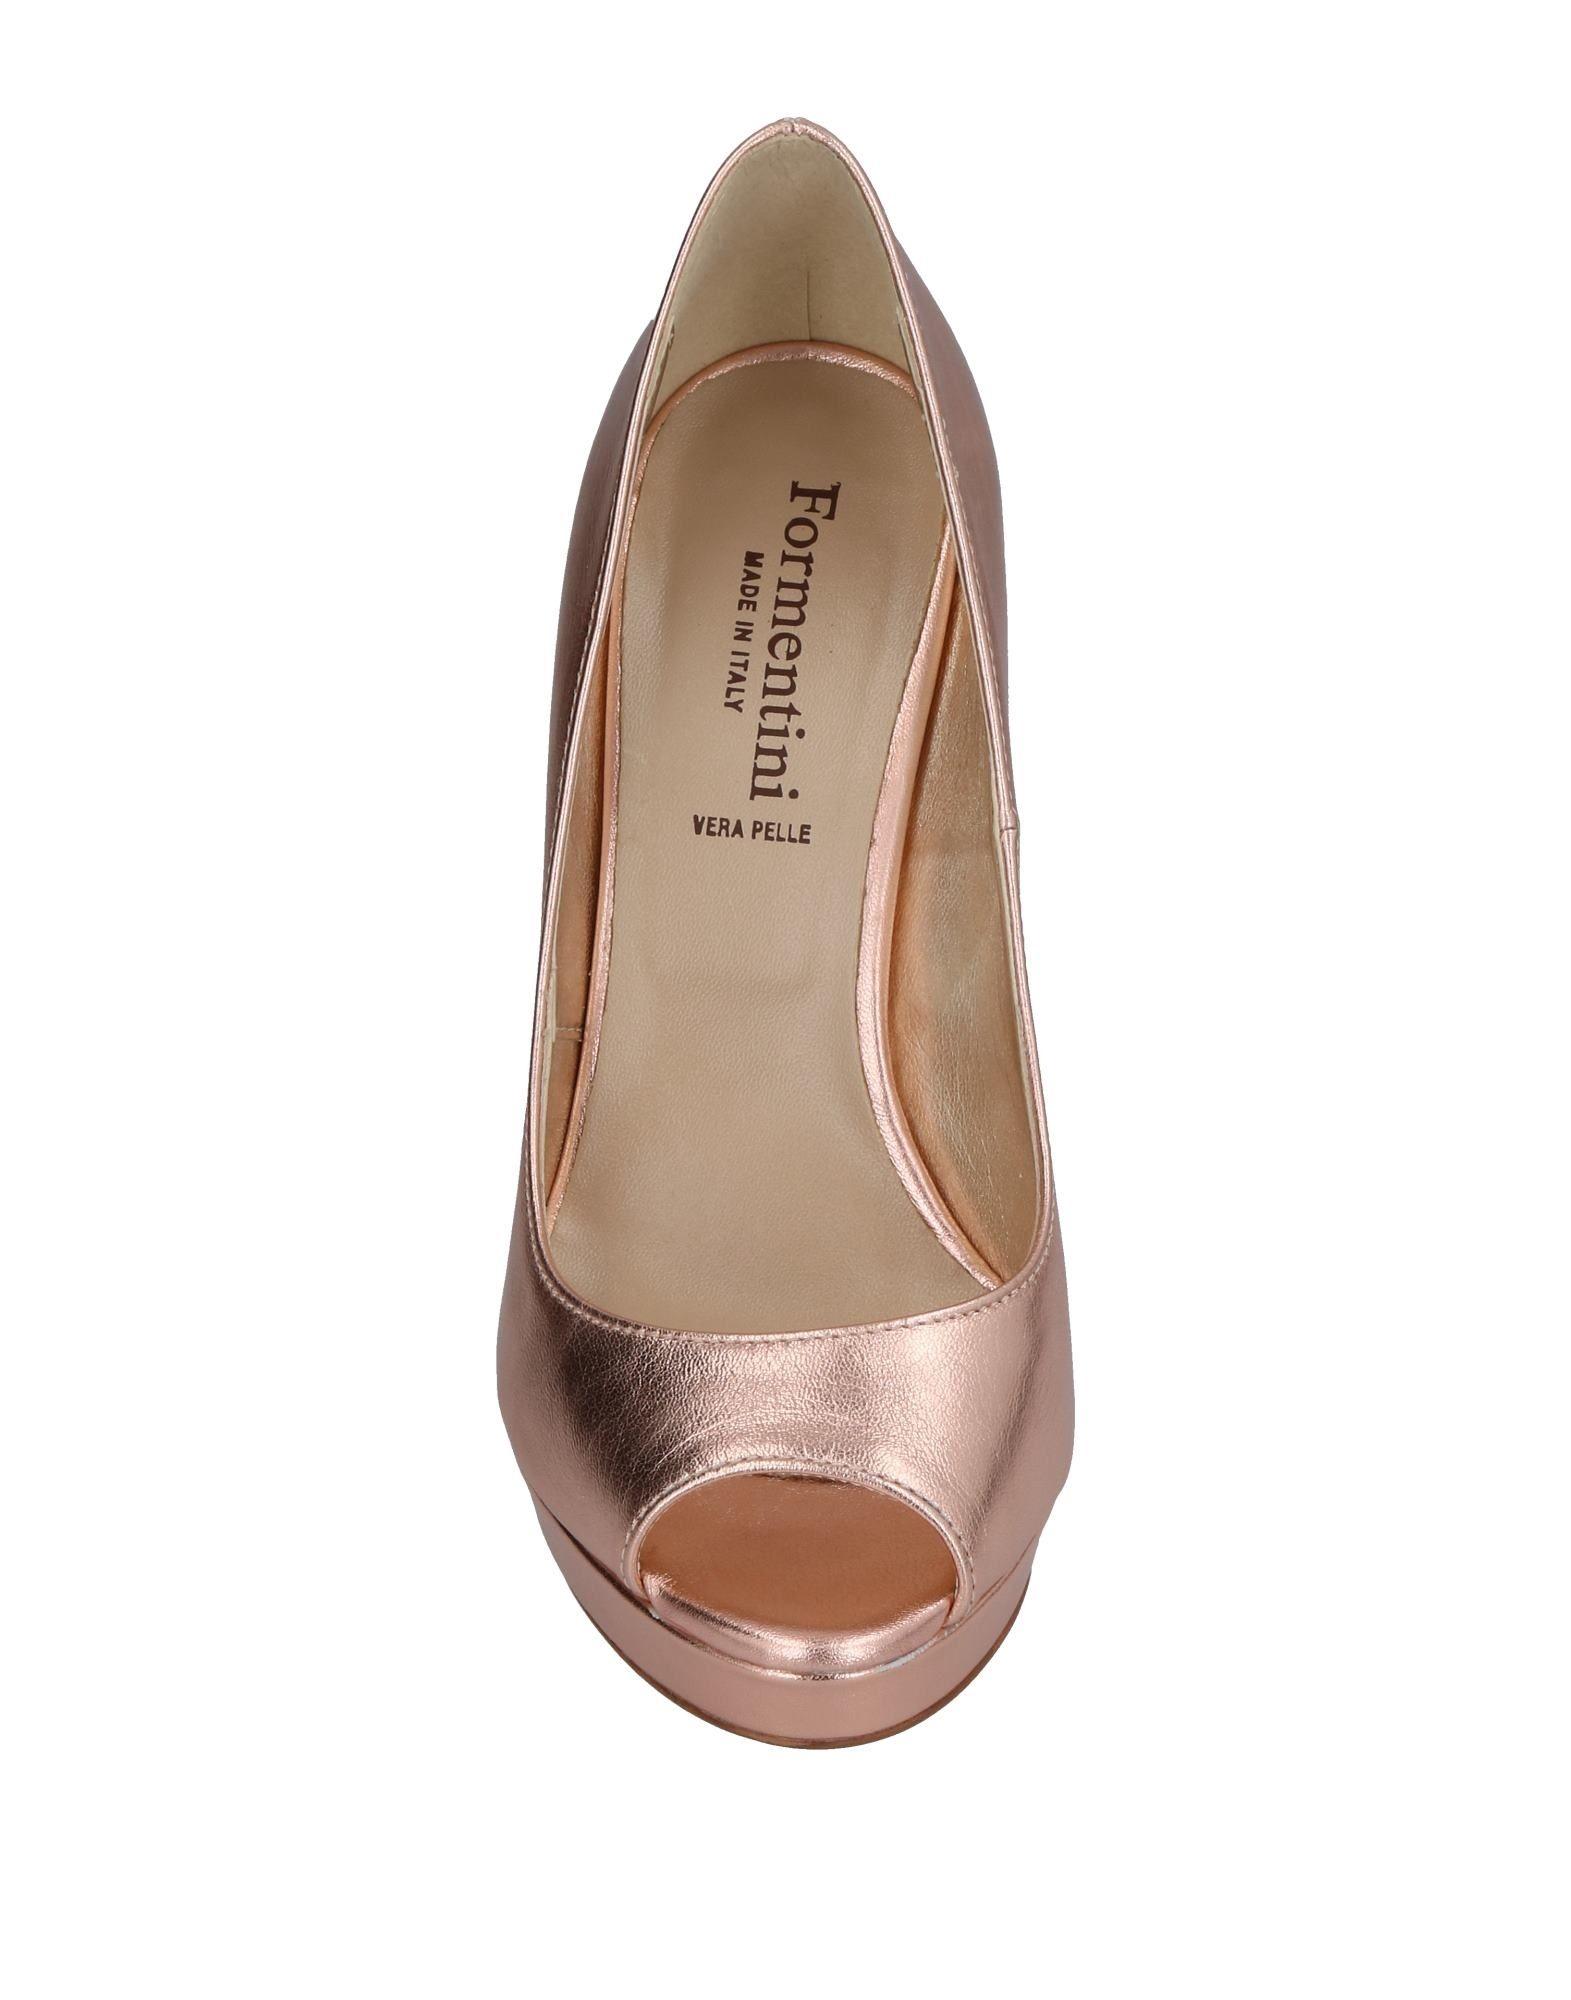 Formentini Pumps Damen Qualität 11375877ER Gute Qualität Damen beliebte Schuhe f0f803